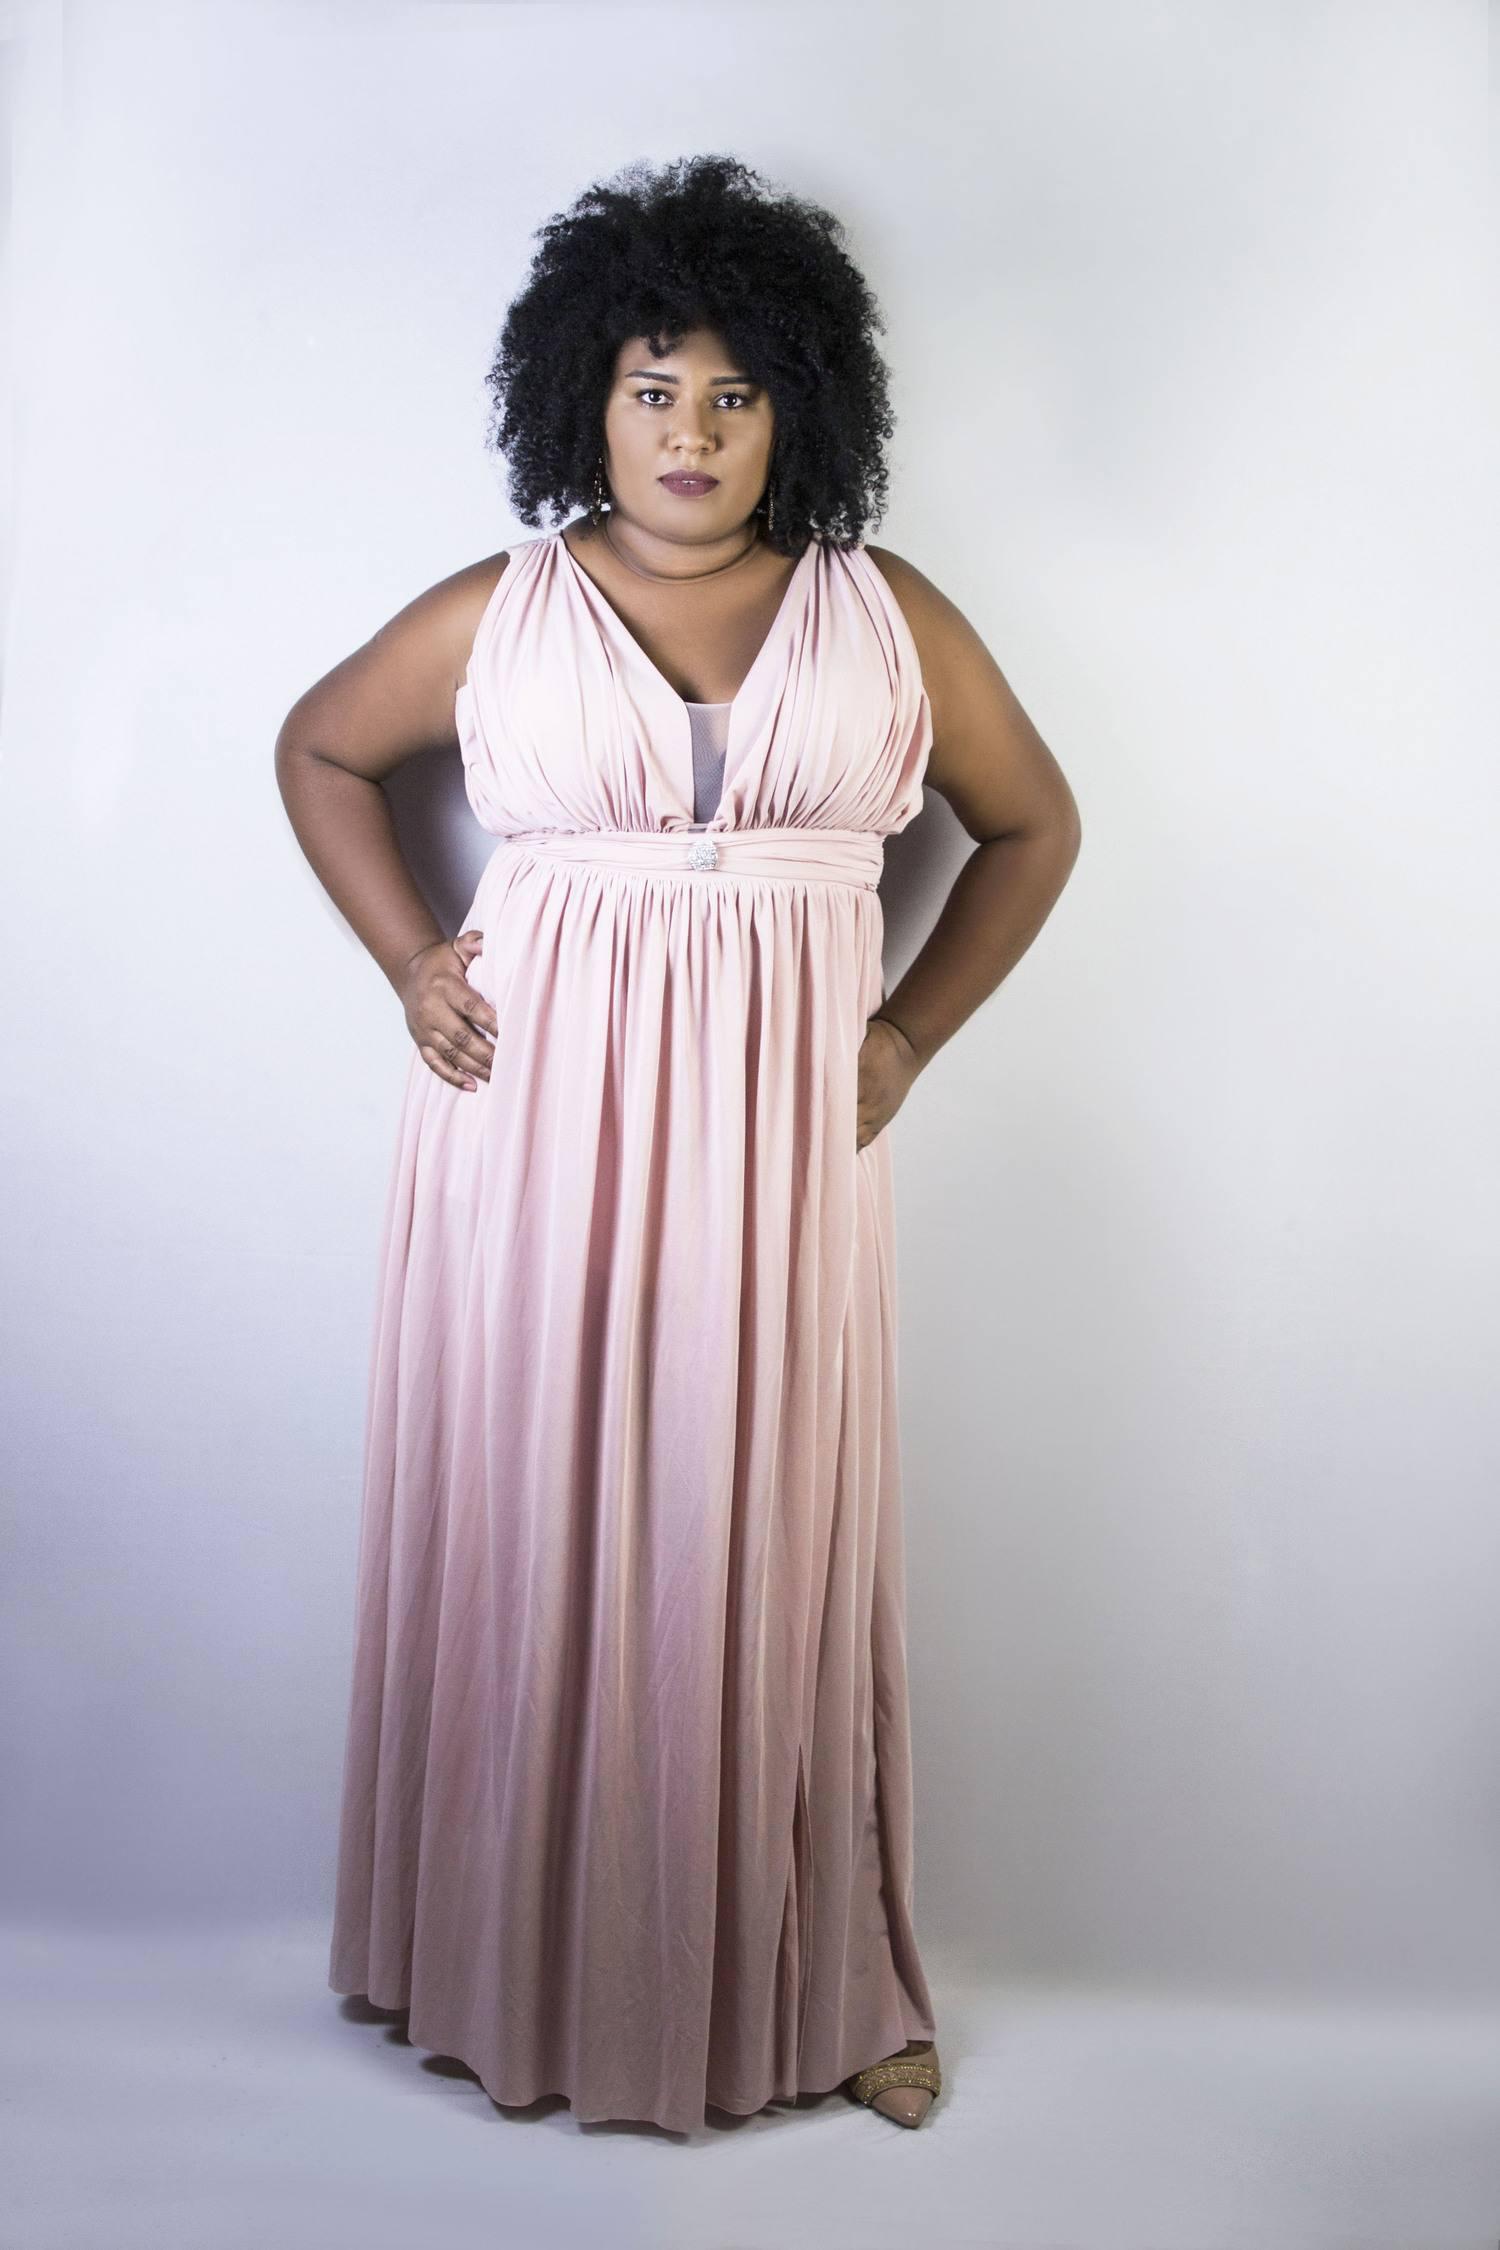 Vestido Feminino Longo De Festa Plus Size Ariadine